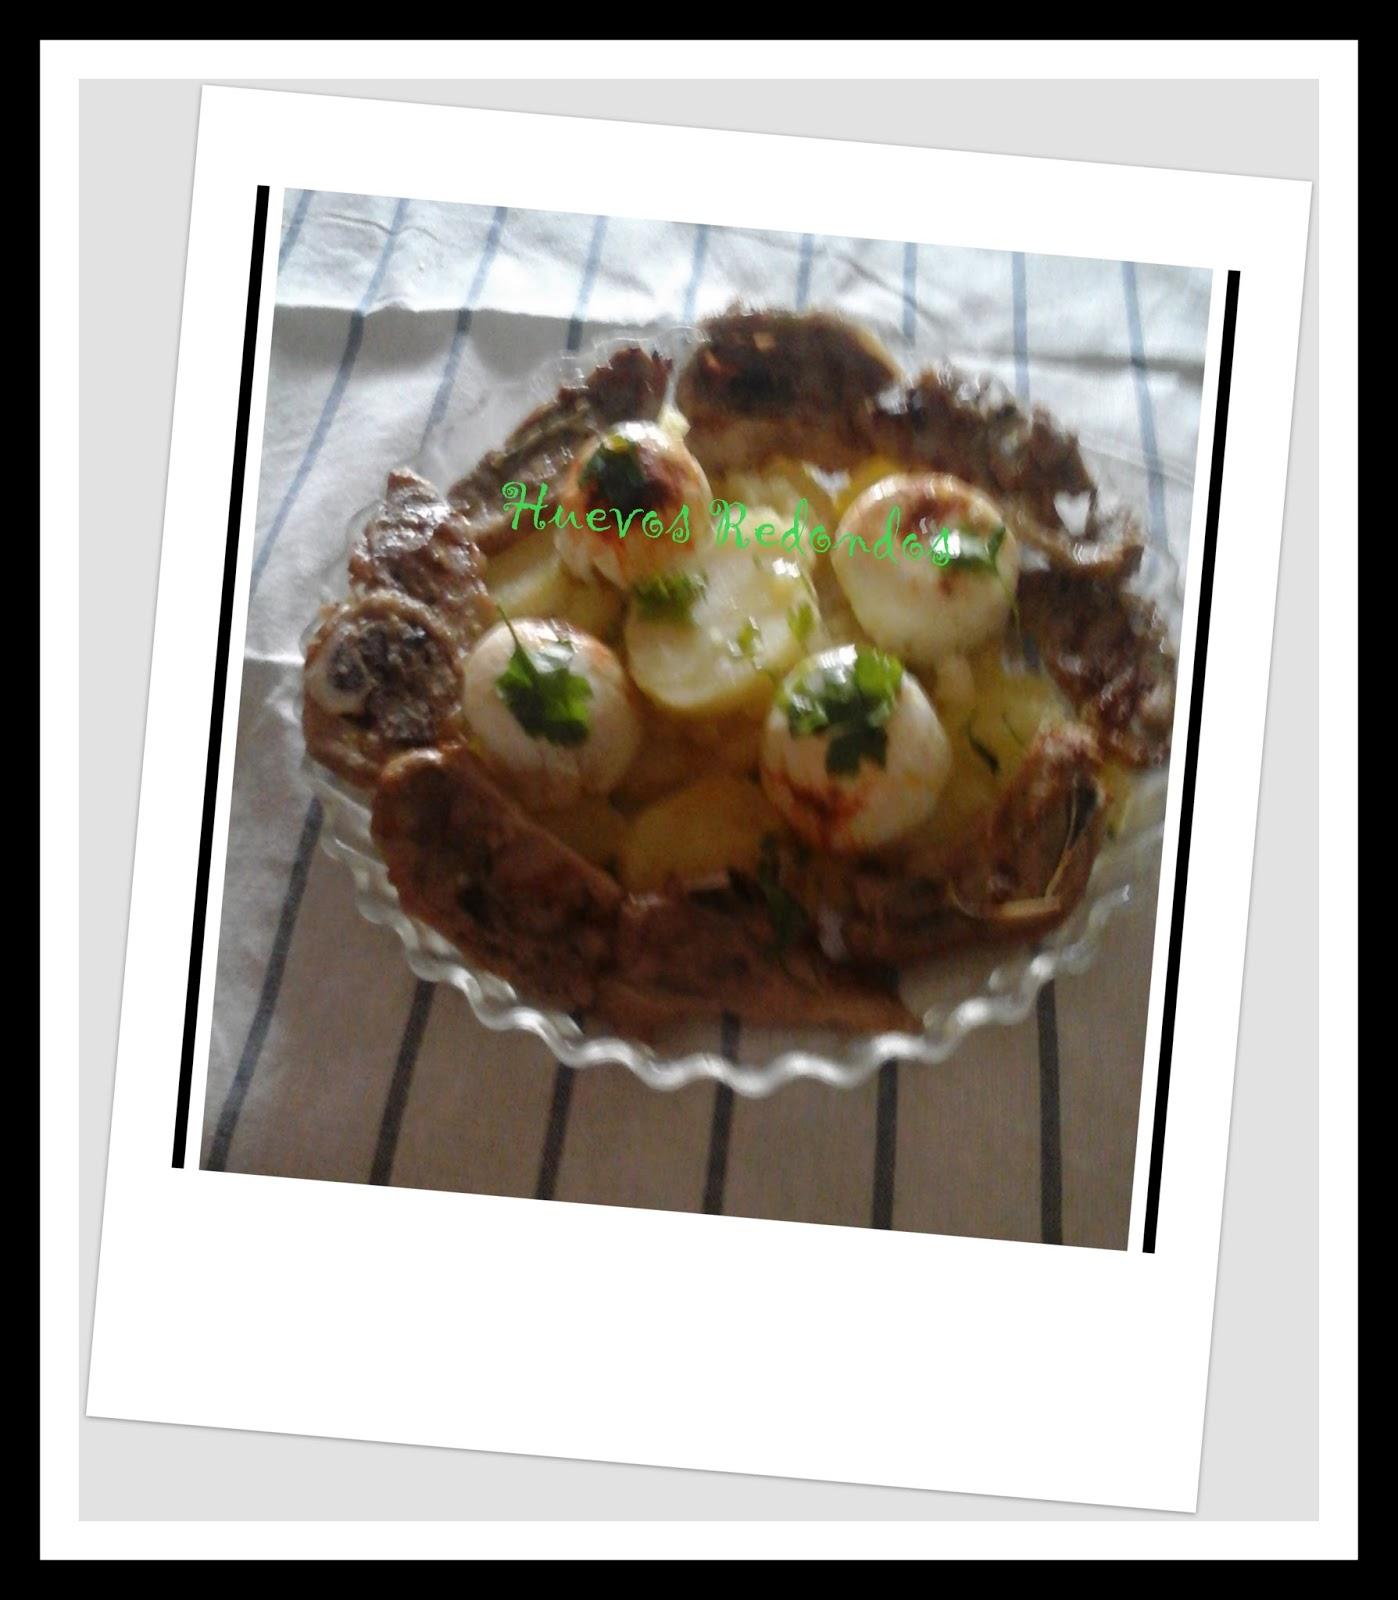 Huevos Redondos con patatas